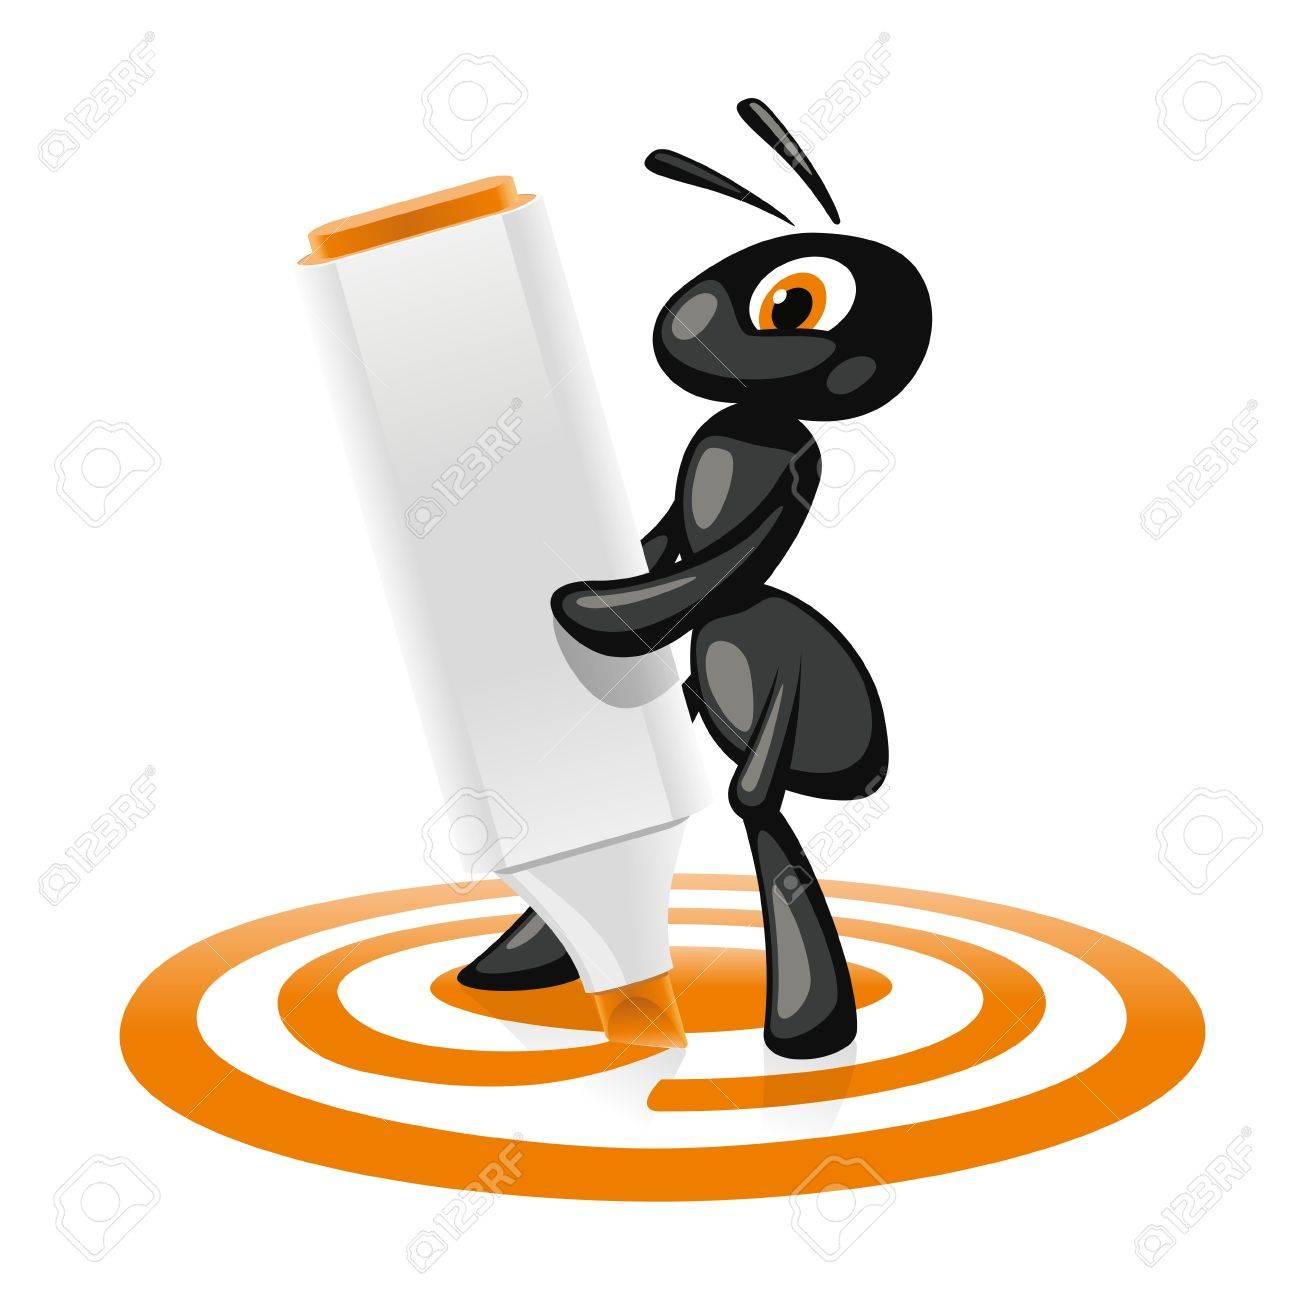 Ant Target  Little ant orange marker outline a goal Stock Vector - 24538927